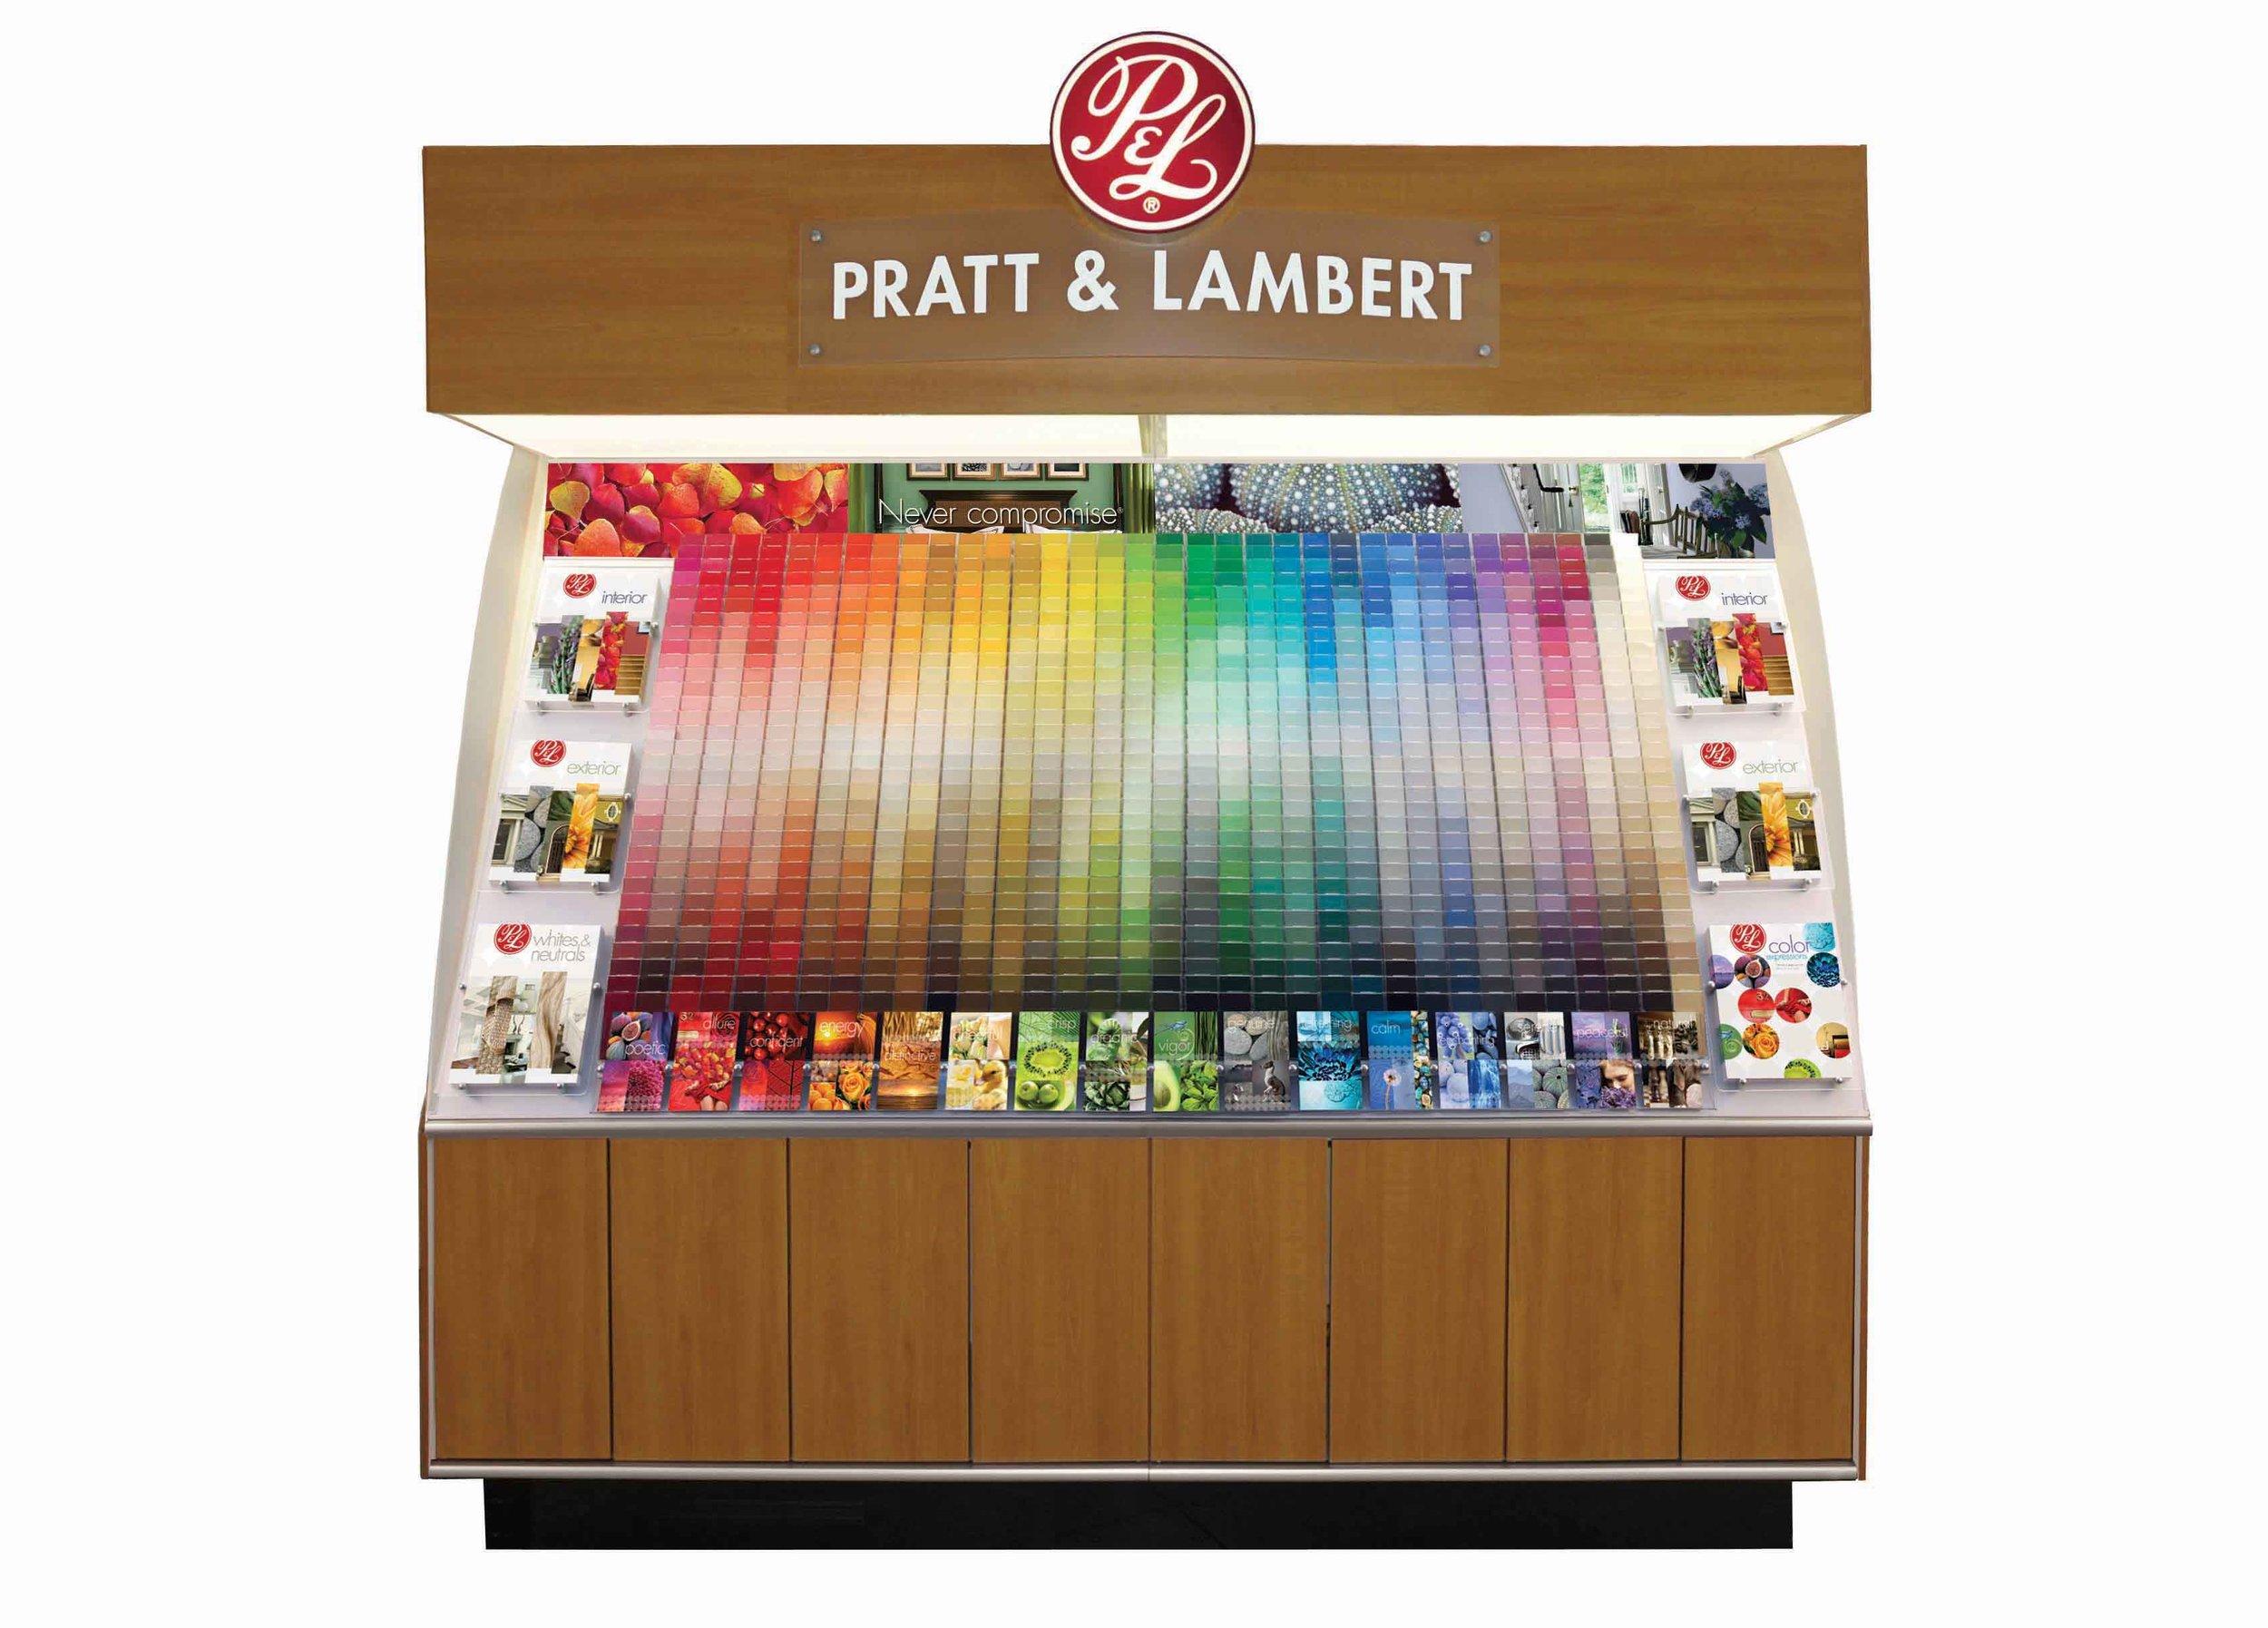 Pratt & Lambert Paint Color System